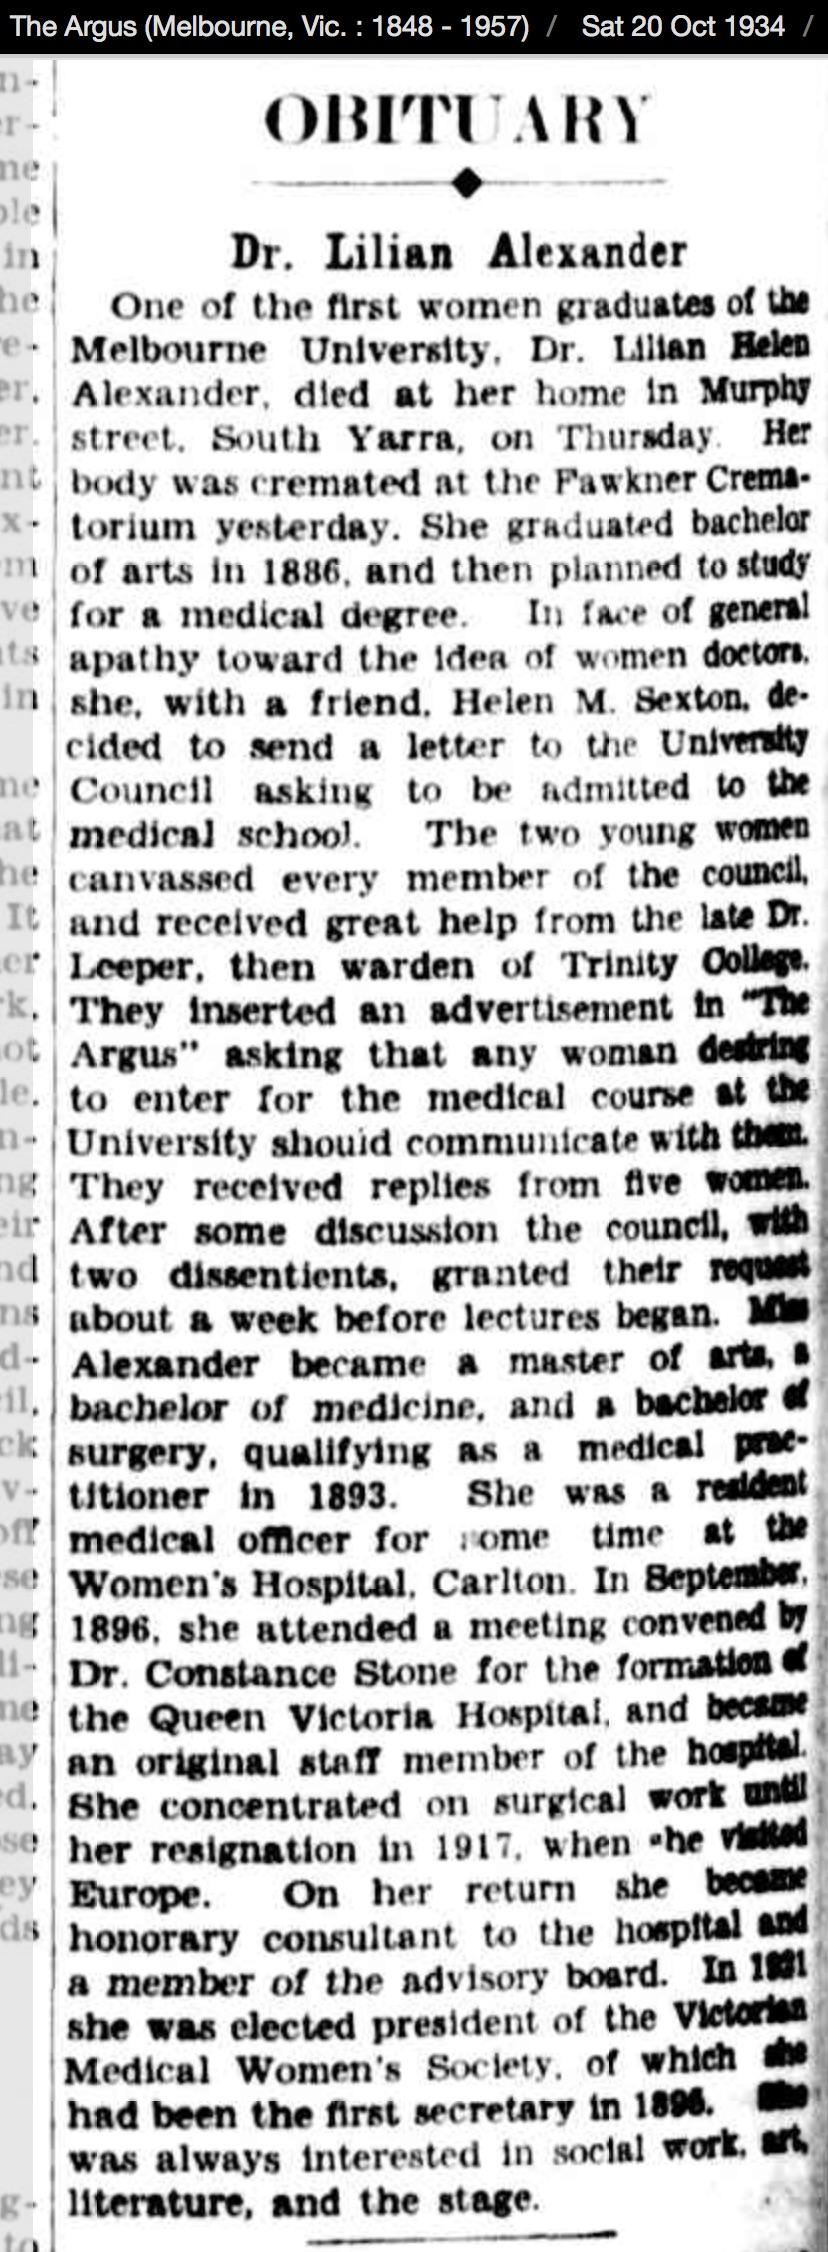 Alexander Lilian obituary Argus 1934 10 20